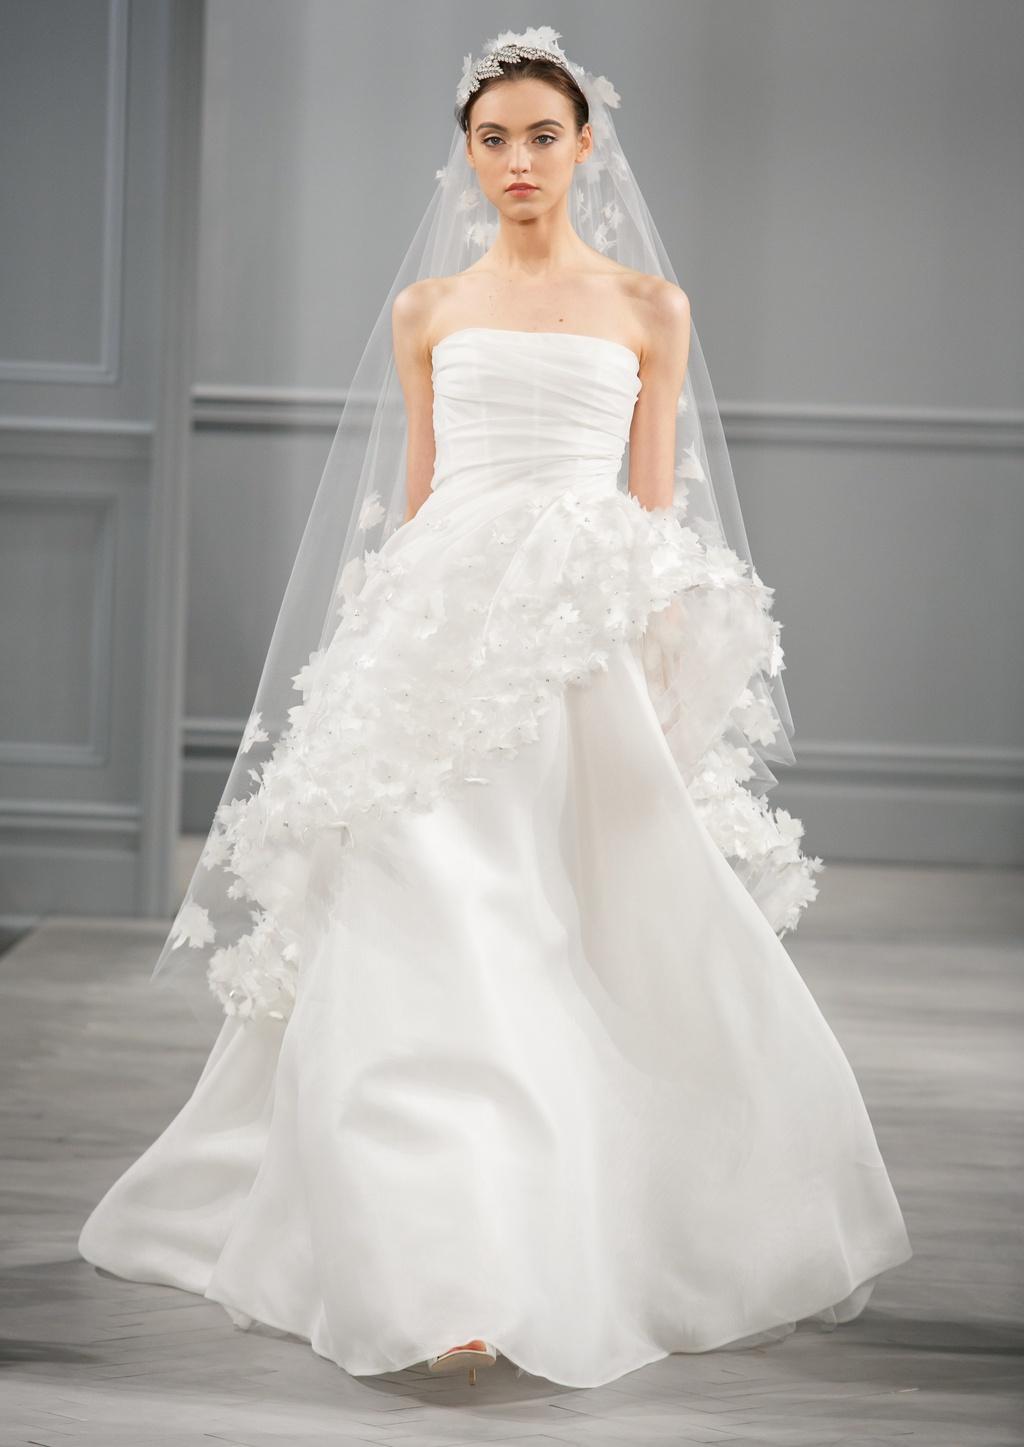 Spring 2014 wedding dress monique lhuillier bridal pearl 3 for Buy monique lhuillier wedding dress